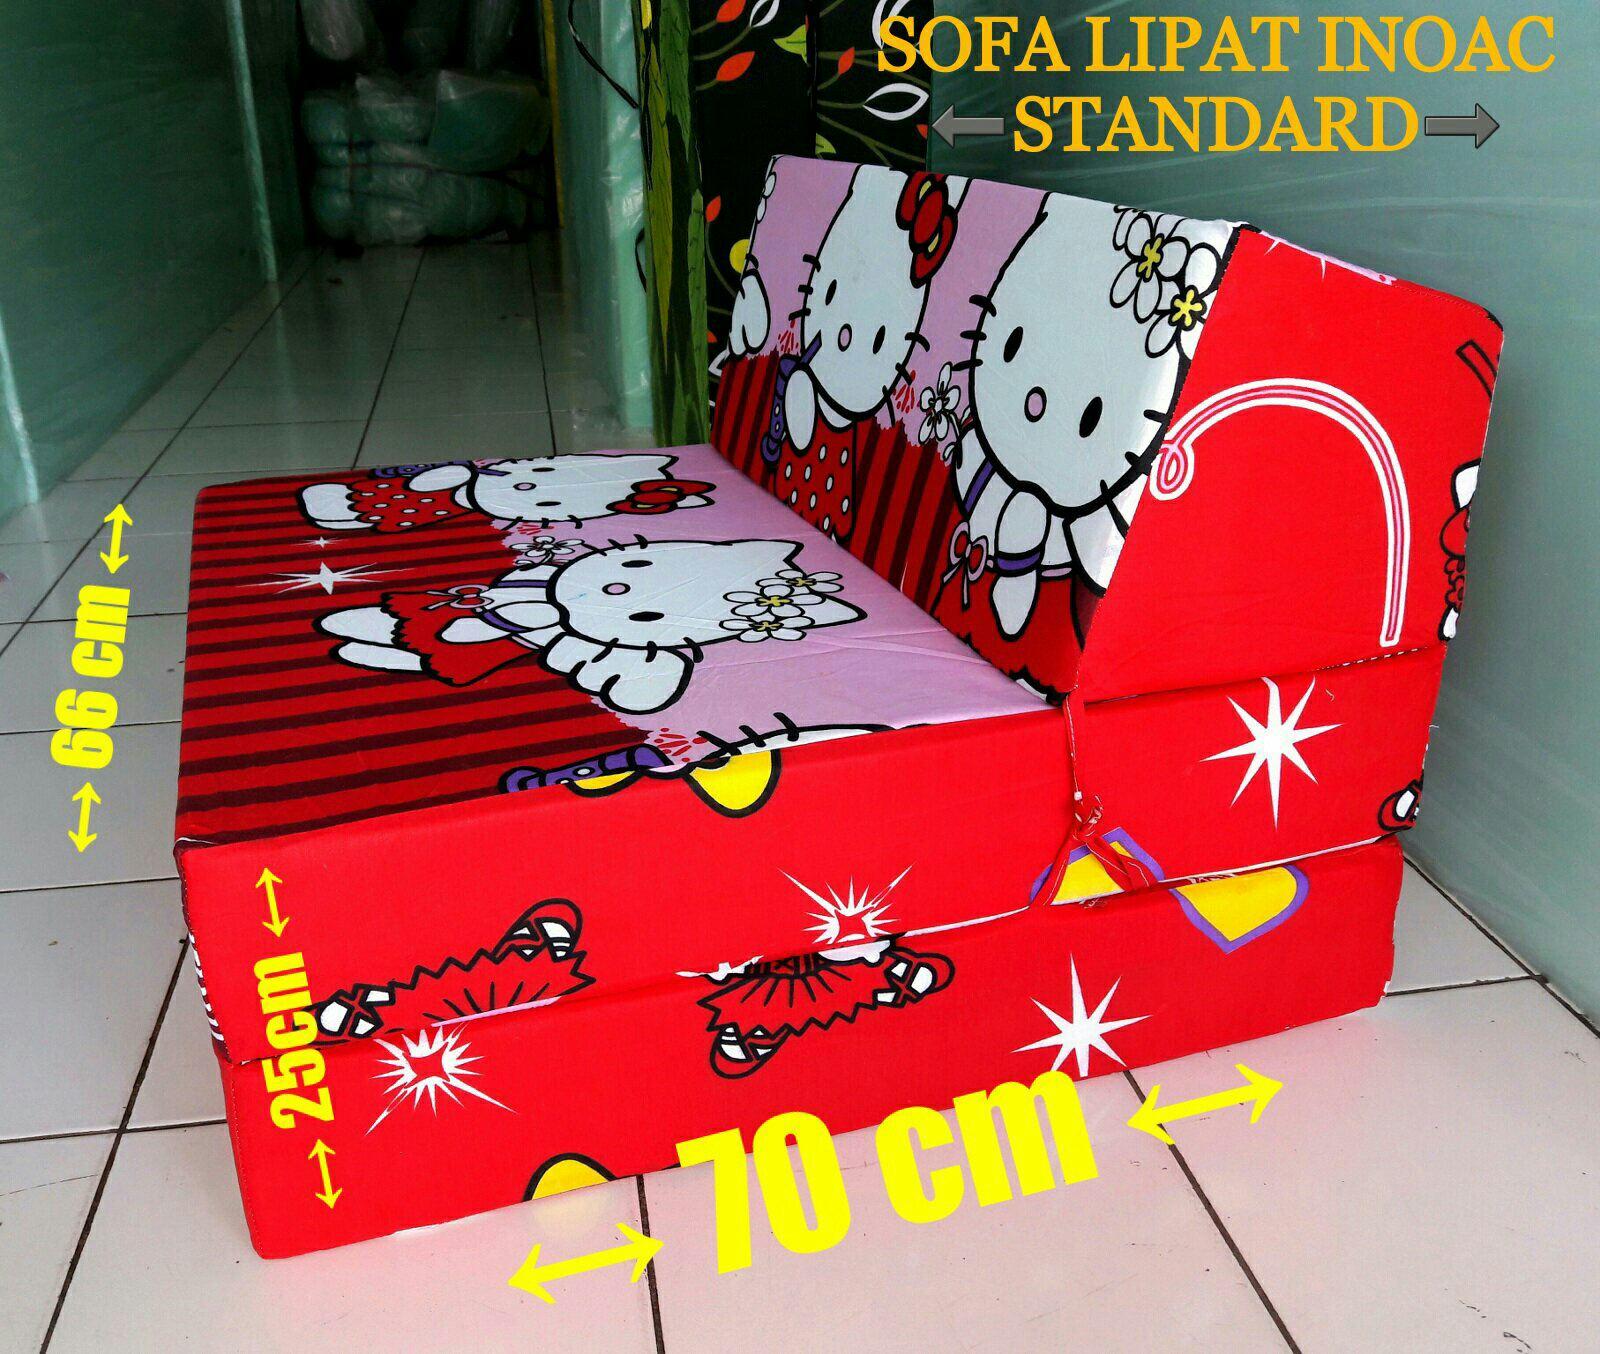 sofa bed kasur busa lipat inoac jakarta recliner single malaysia agen jual ef